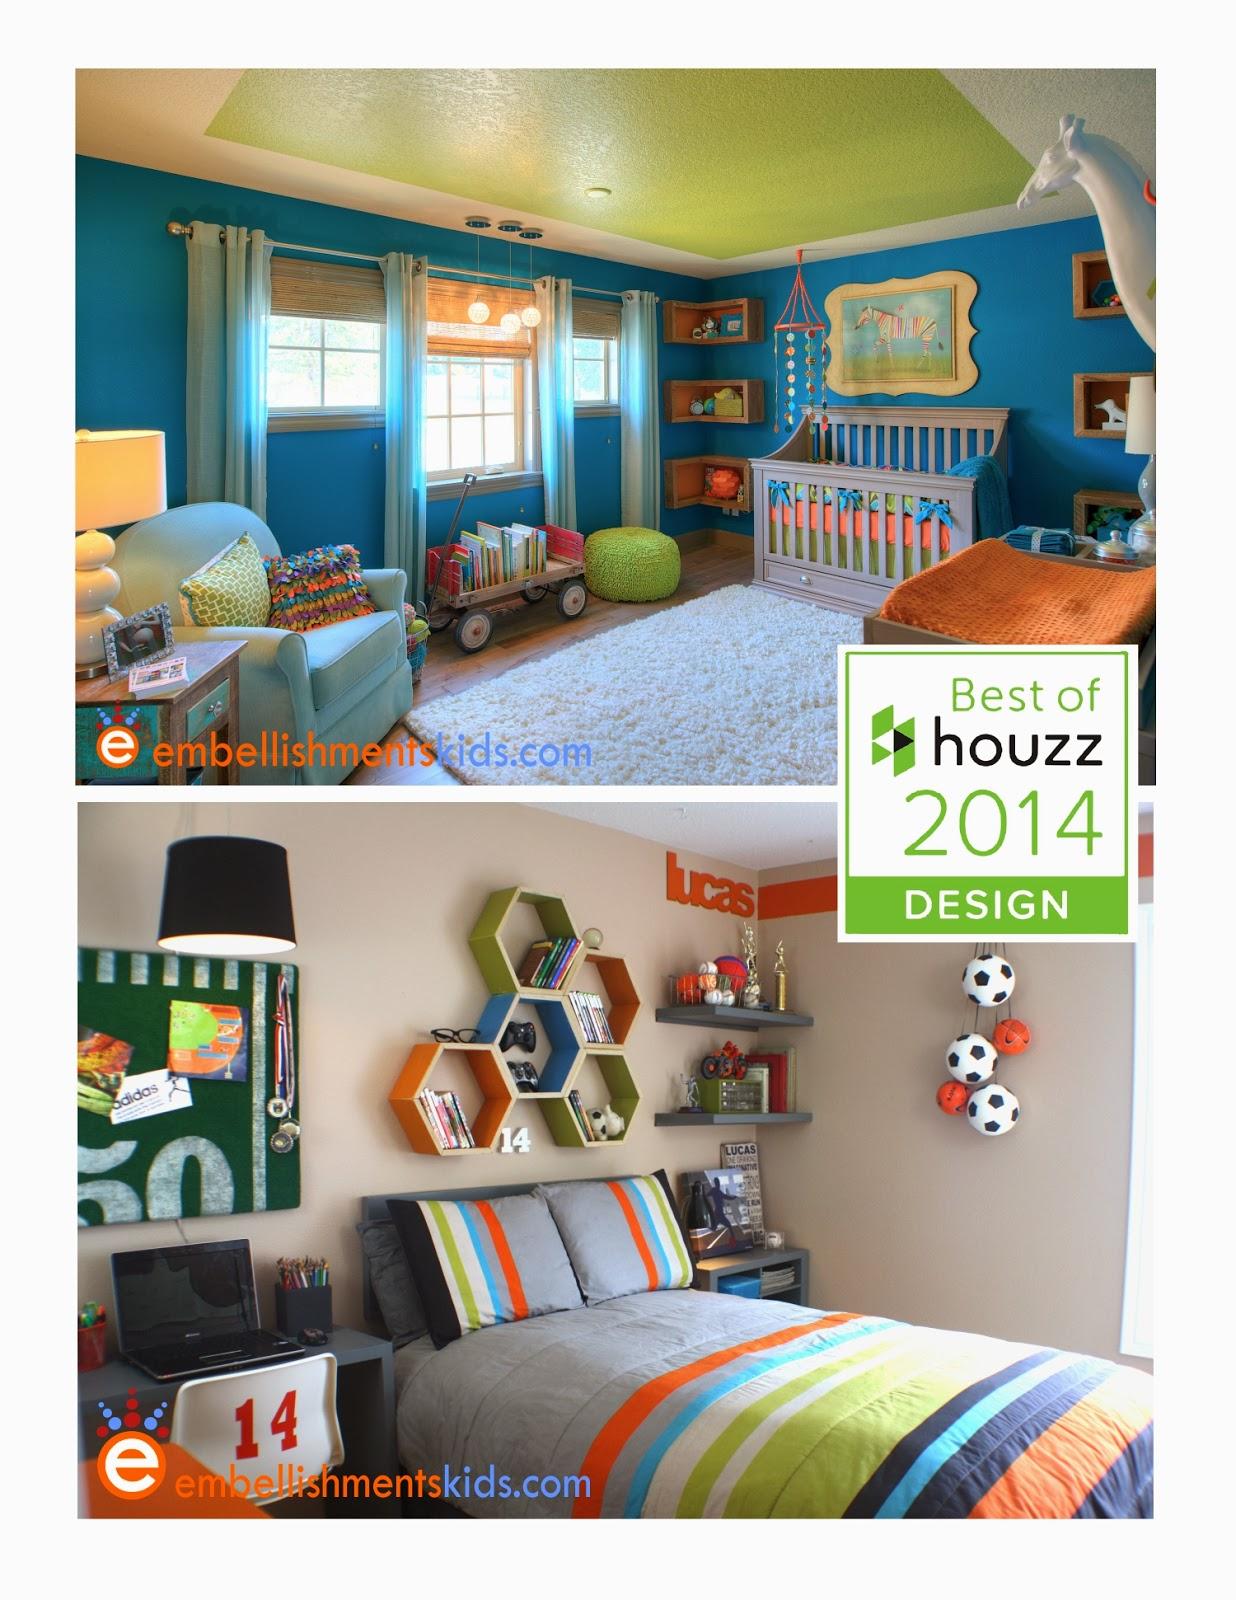 Embellishments kids two embellishments kids designs for Houzz kids room